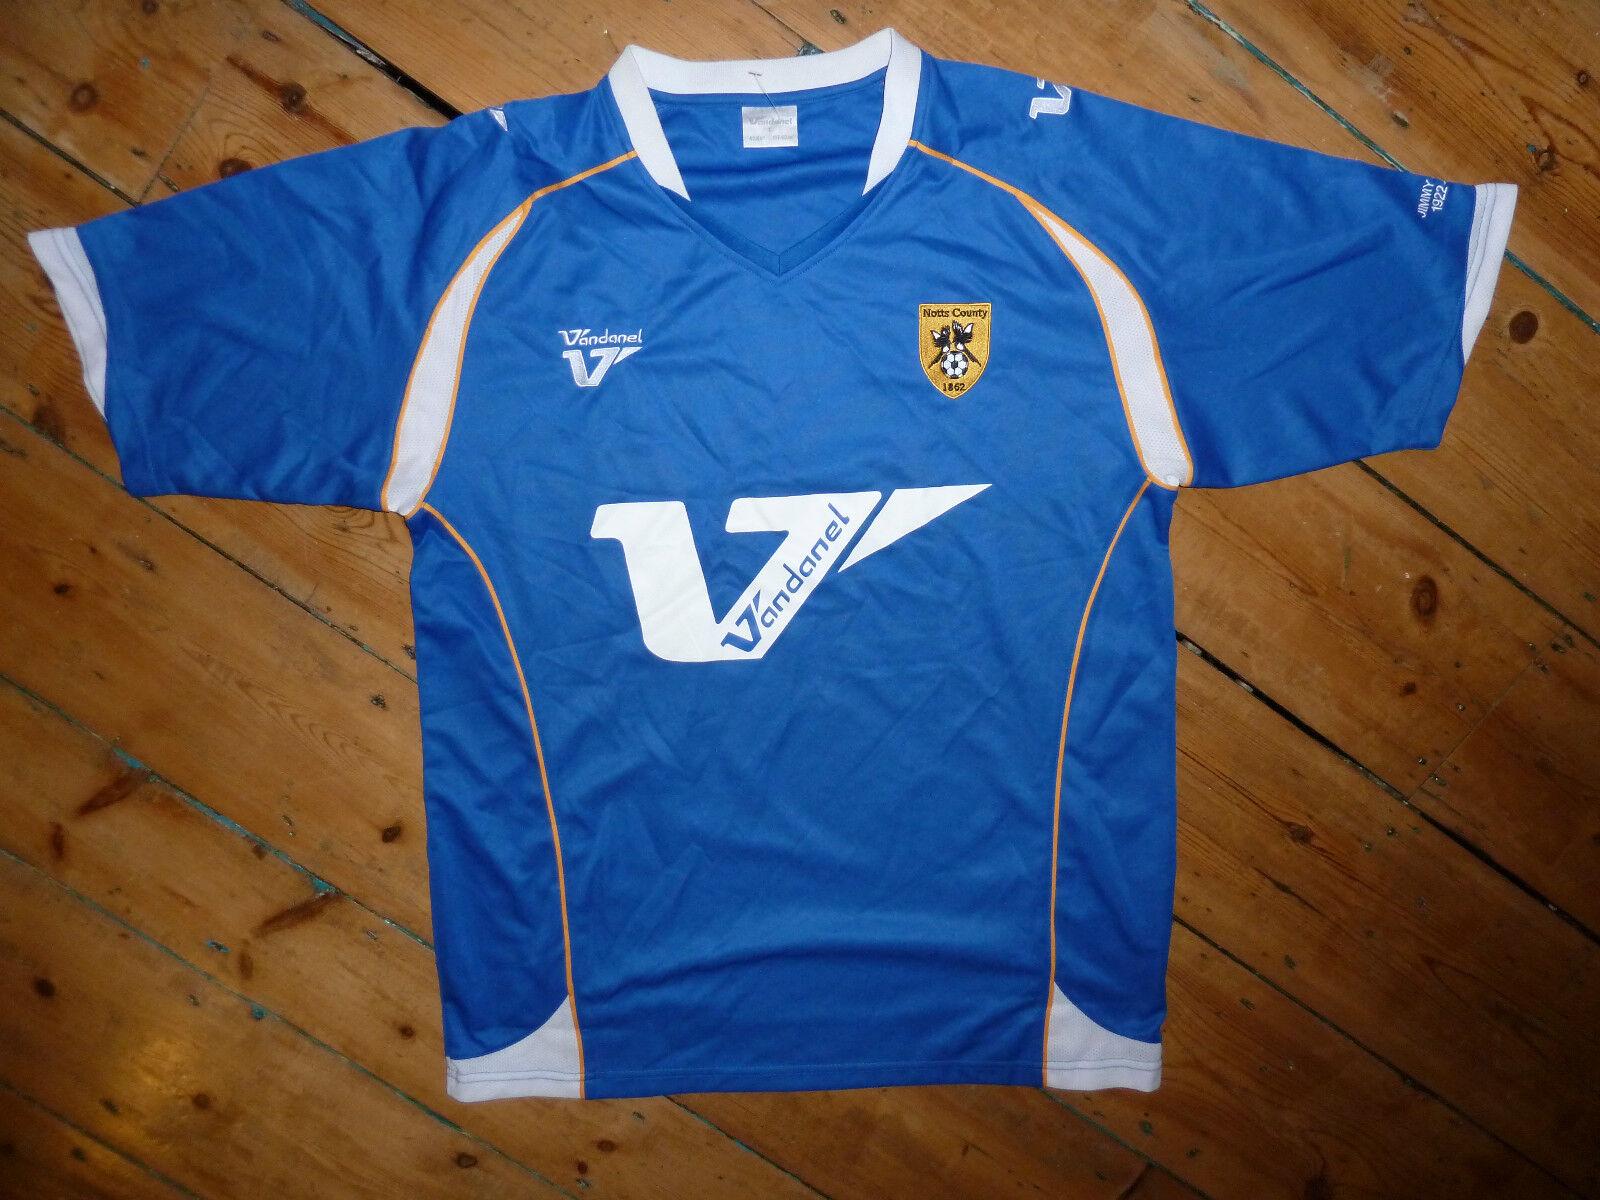 Größe: L/ Notts County FC Shirt Fußball Trikot Entfernt 2007 Camiseta Maglia